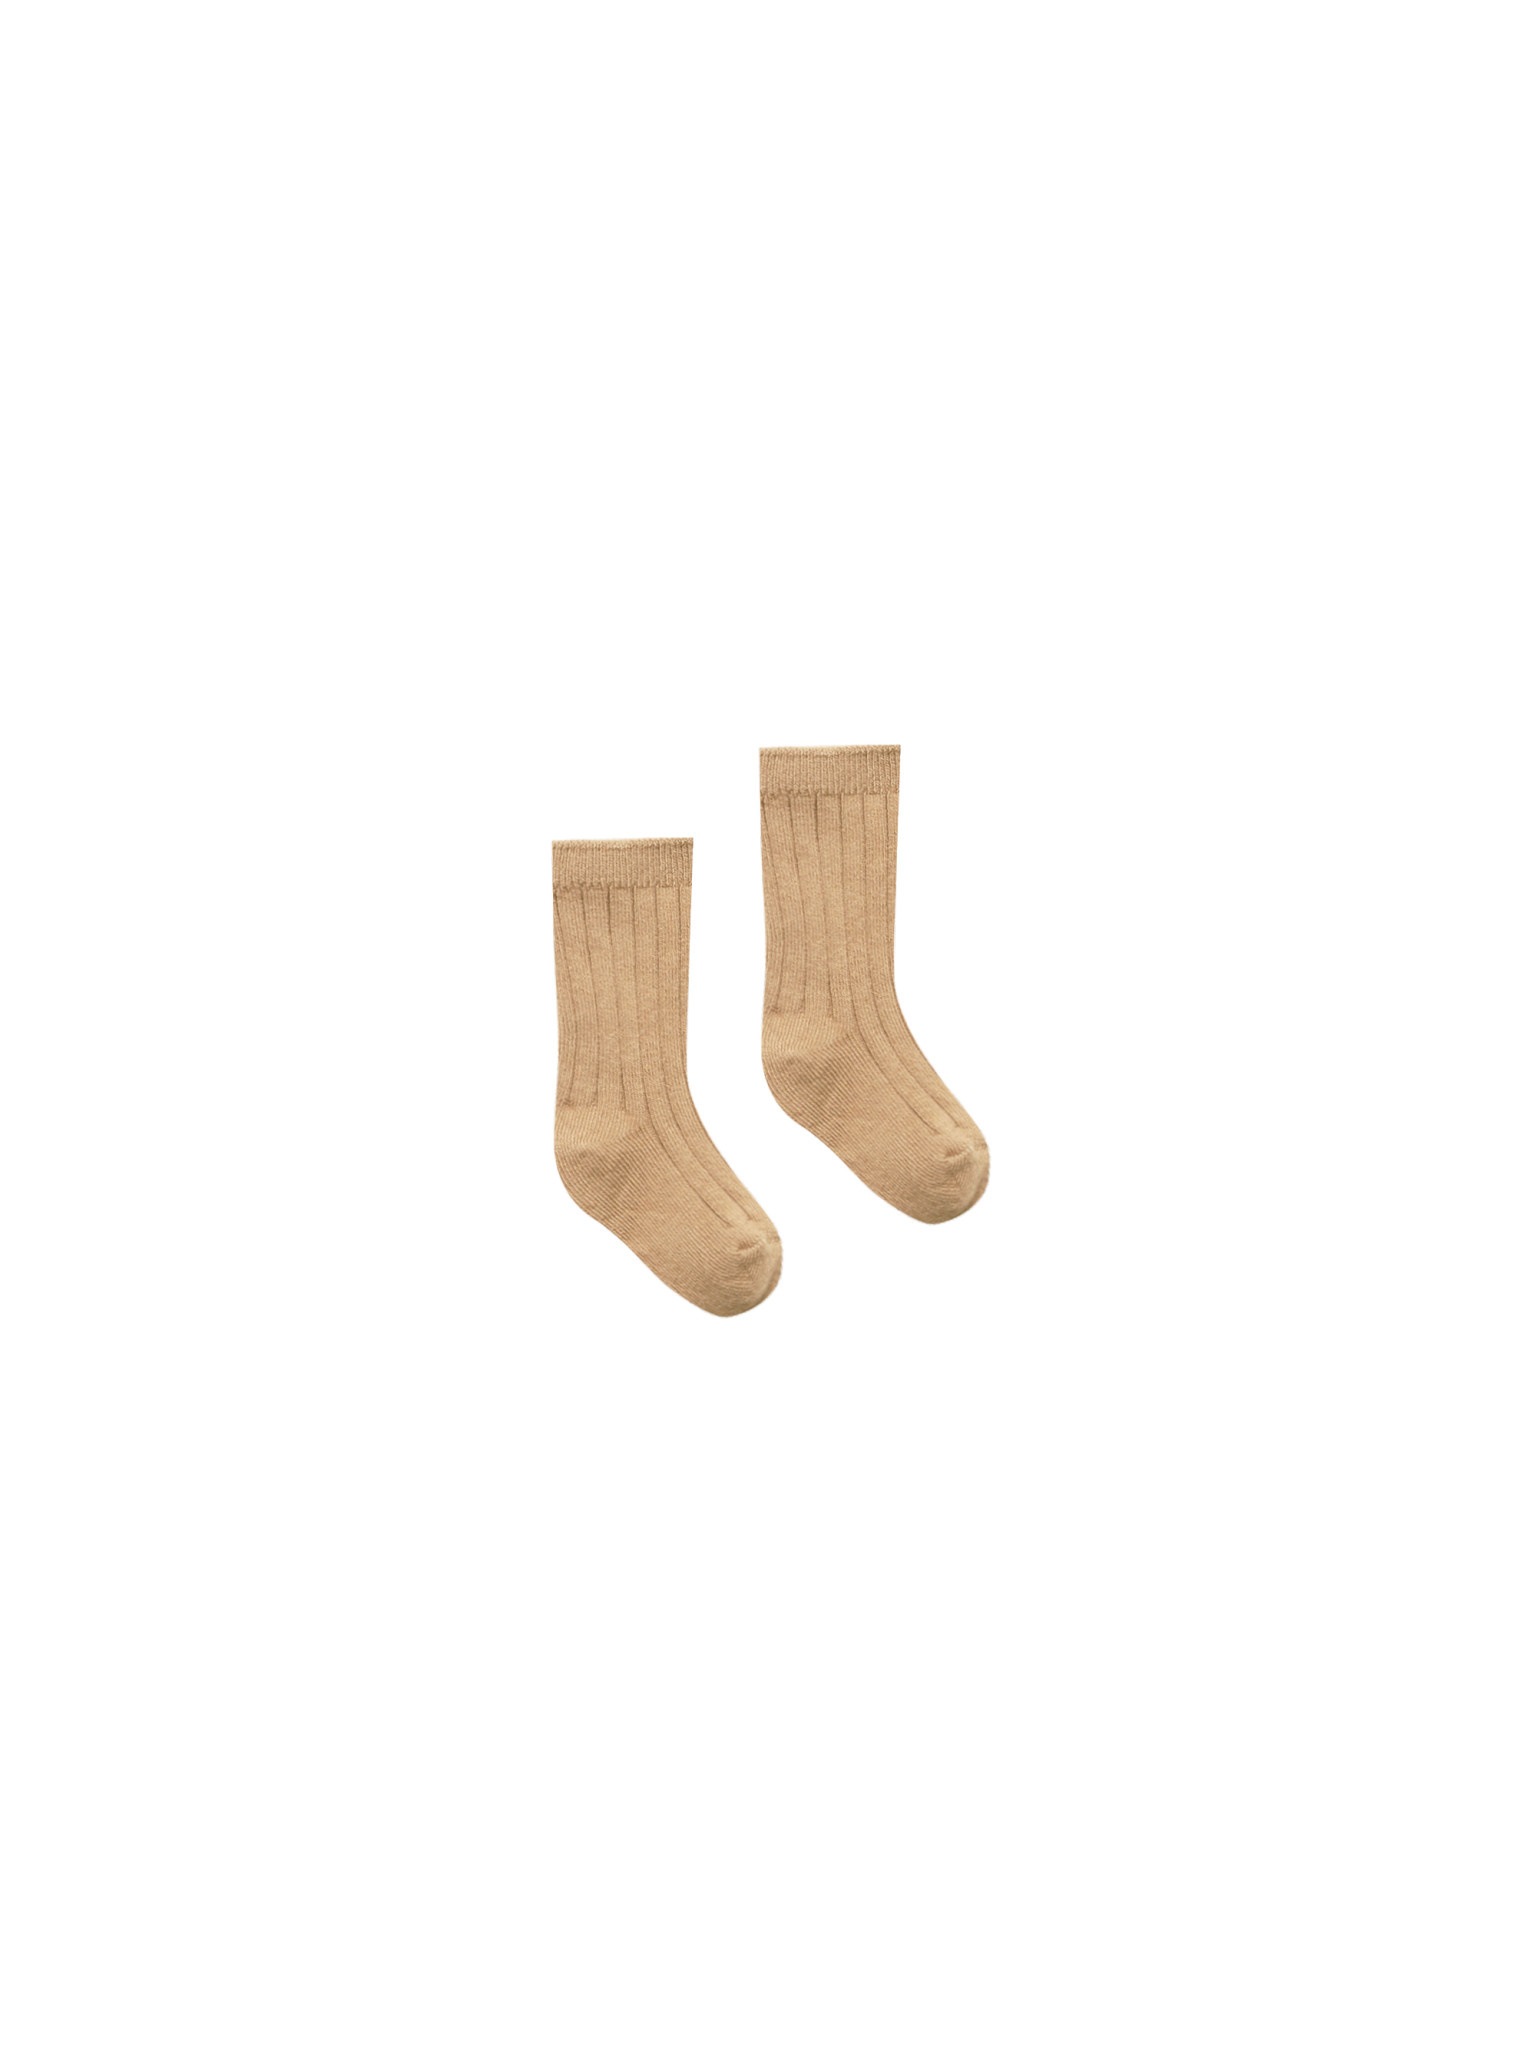 QUINCY MAE Organic 4 Pack Baby Socks